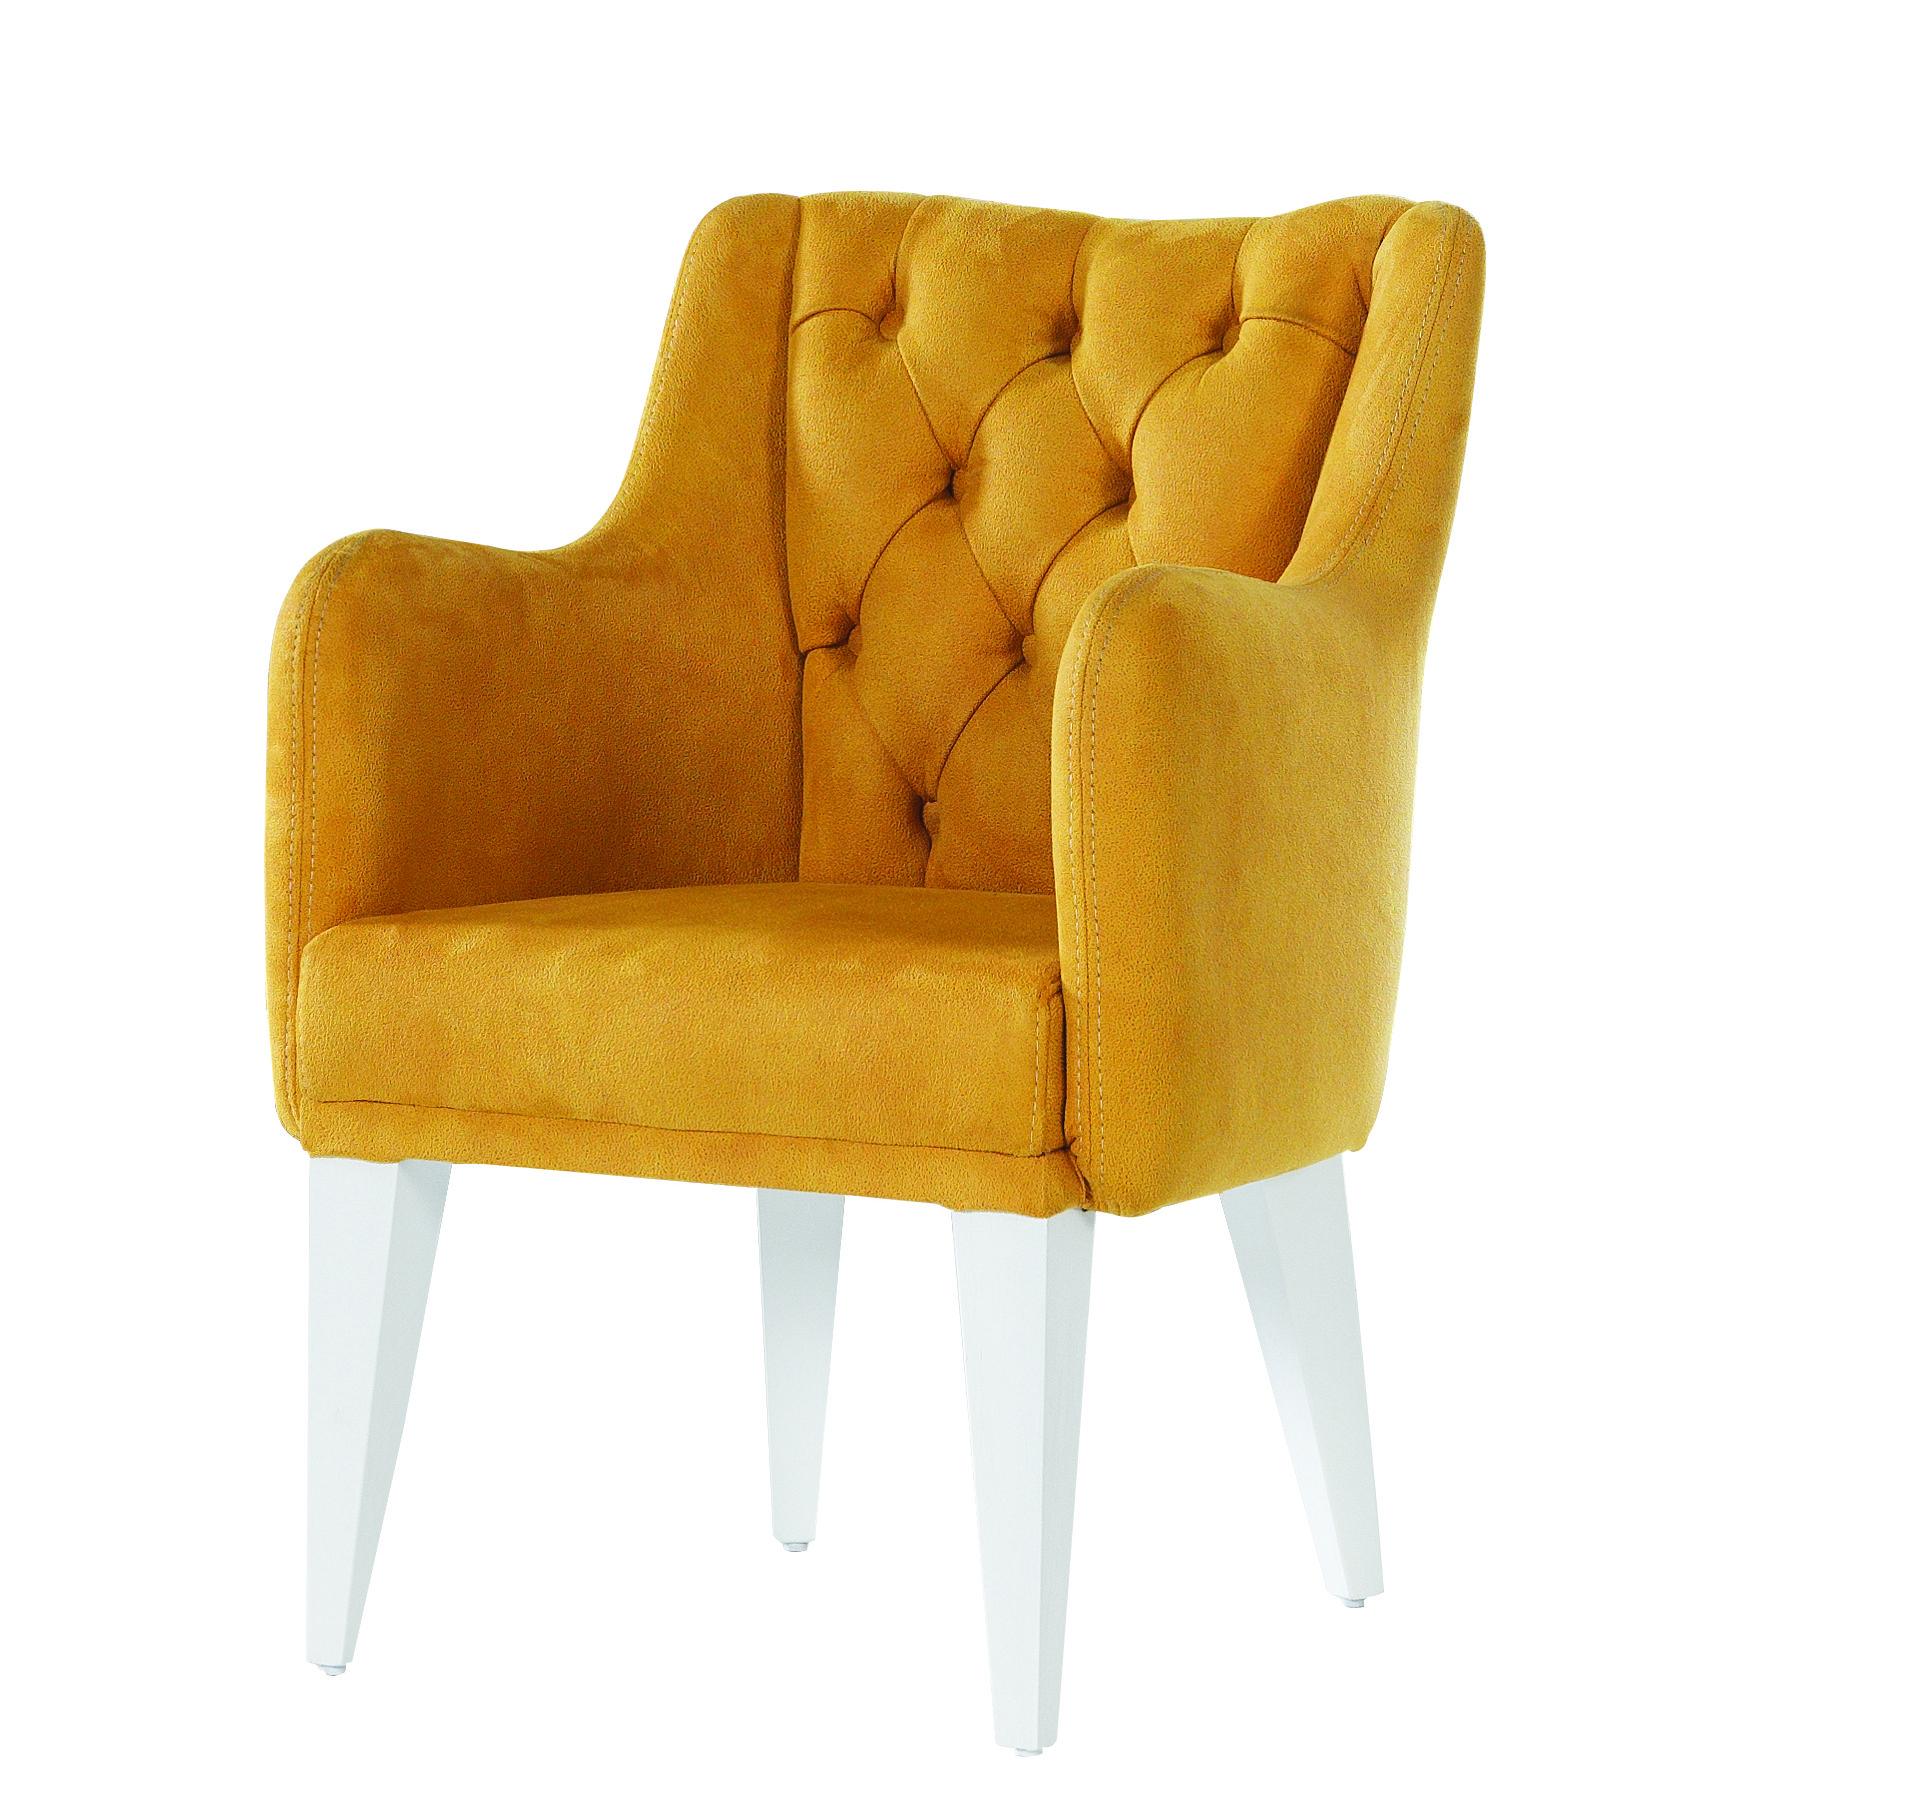 couch yellow m bel zeit. Black Bedroom Furniture Sets. Home Design Ideas